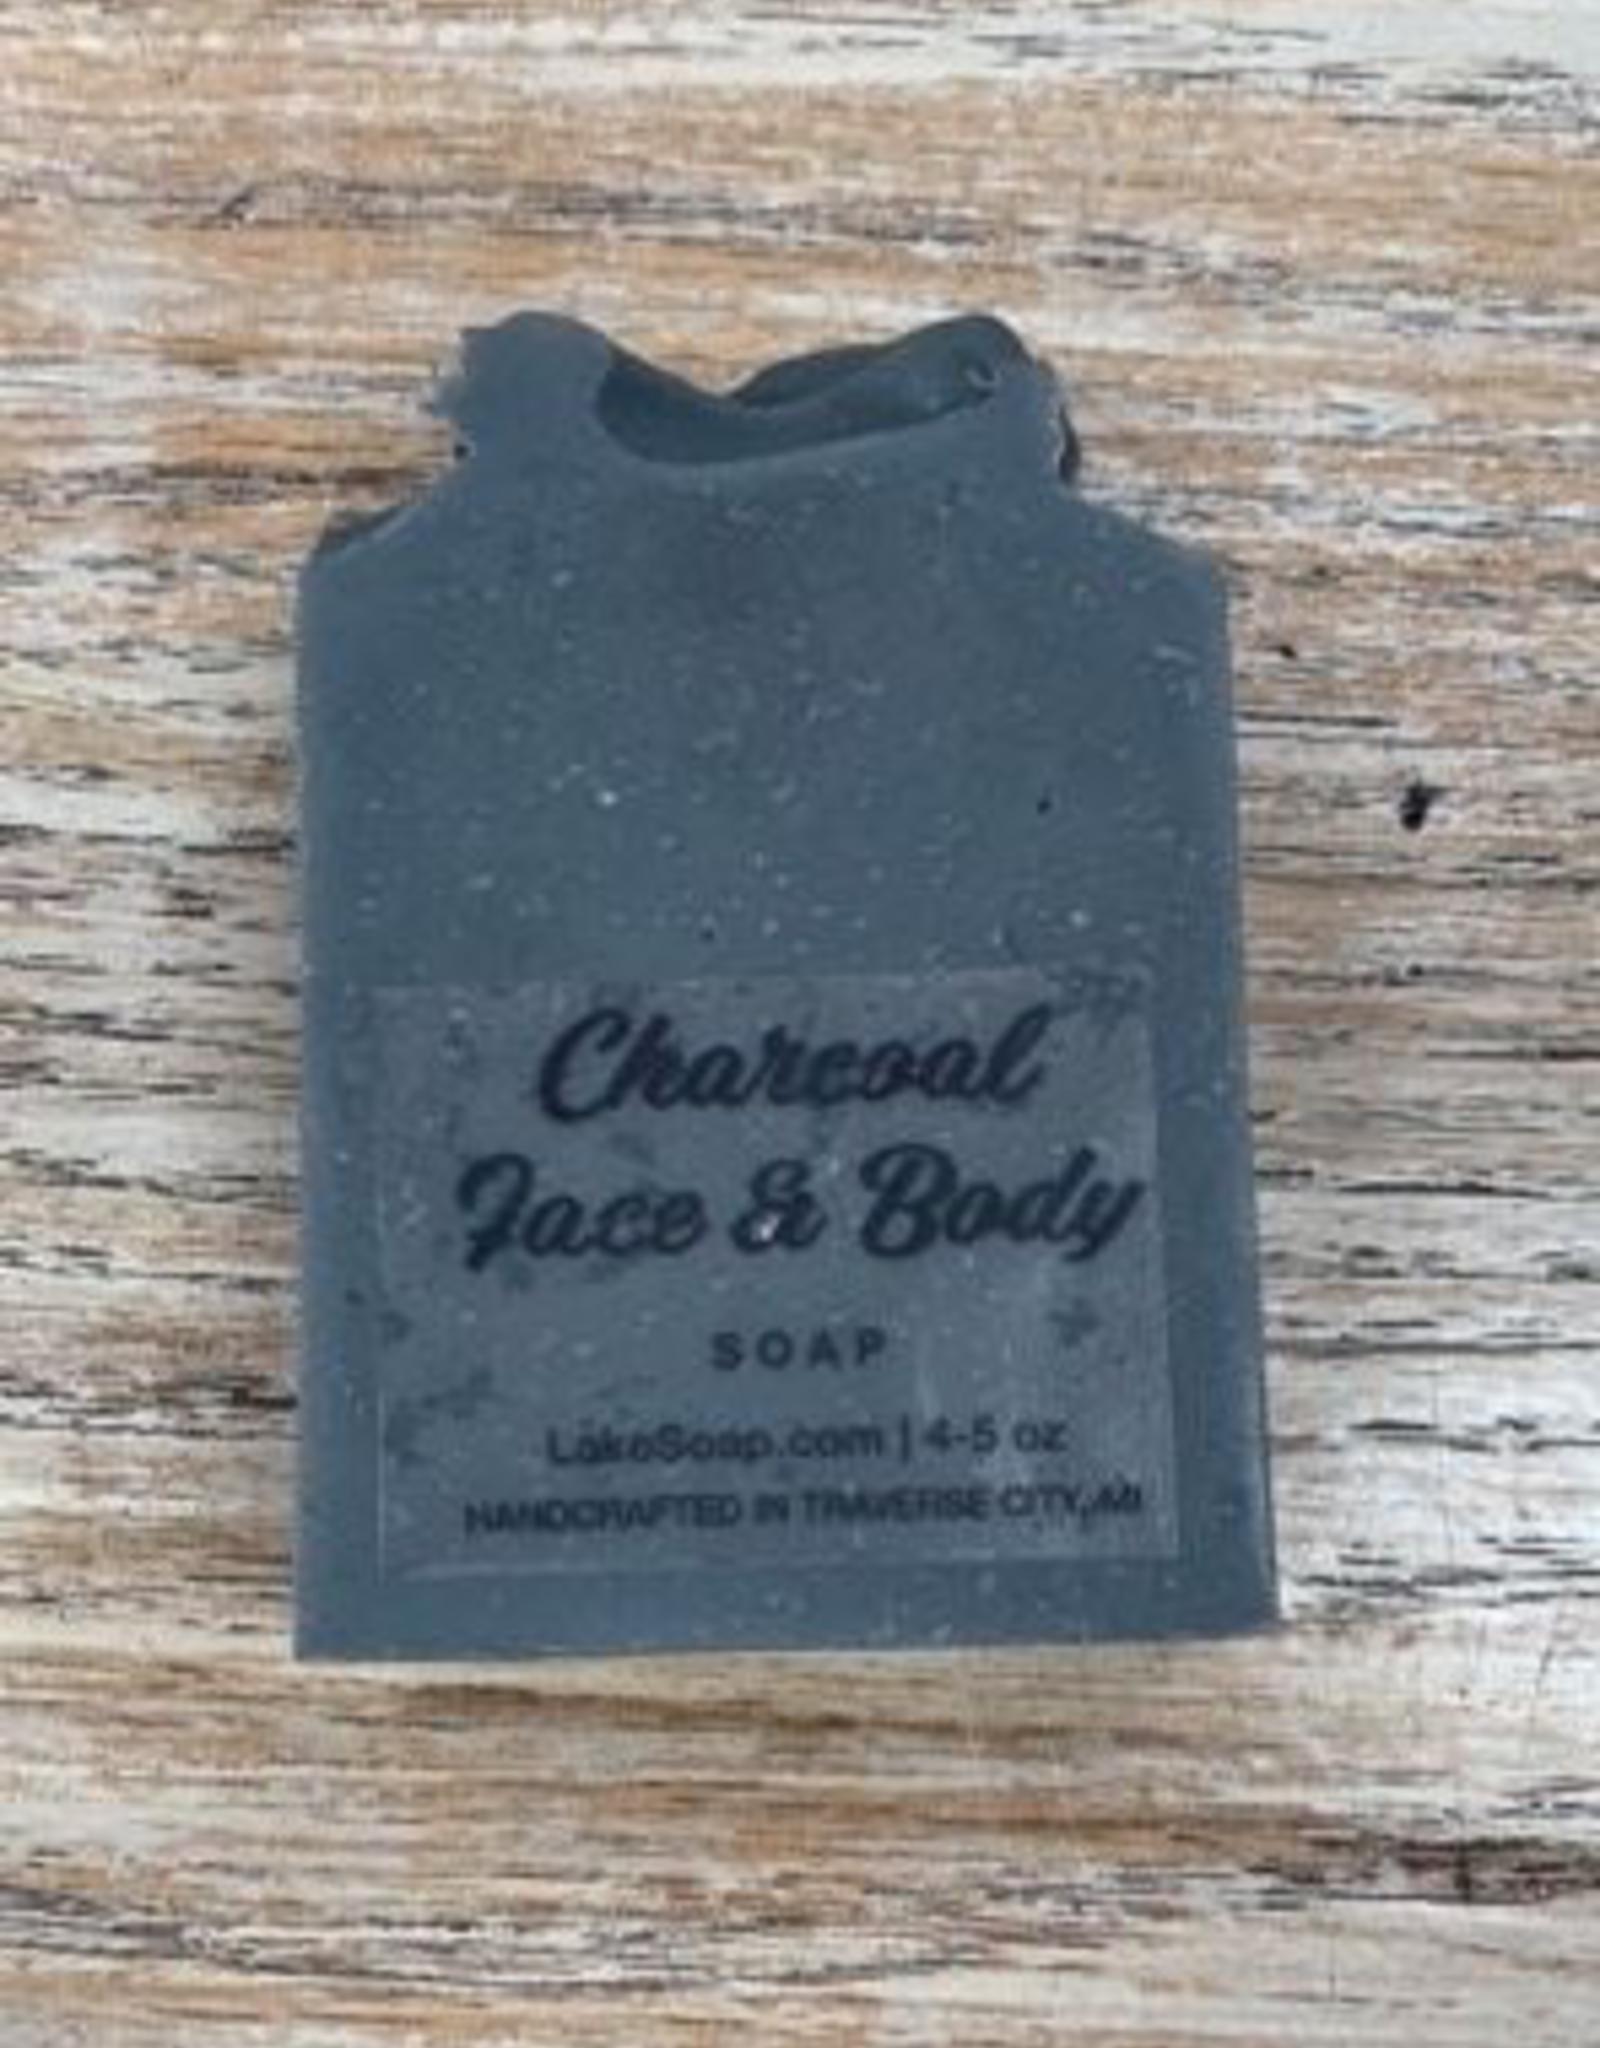 Beauty Lake Soap, Charcoal Face & Body